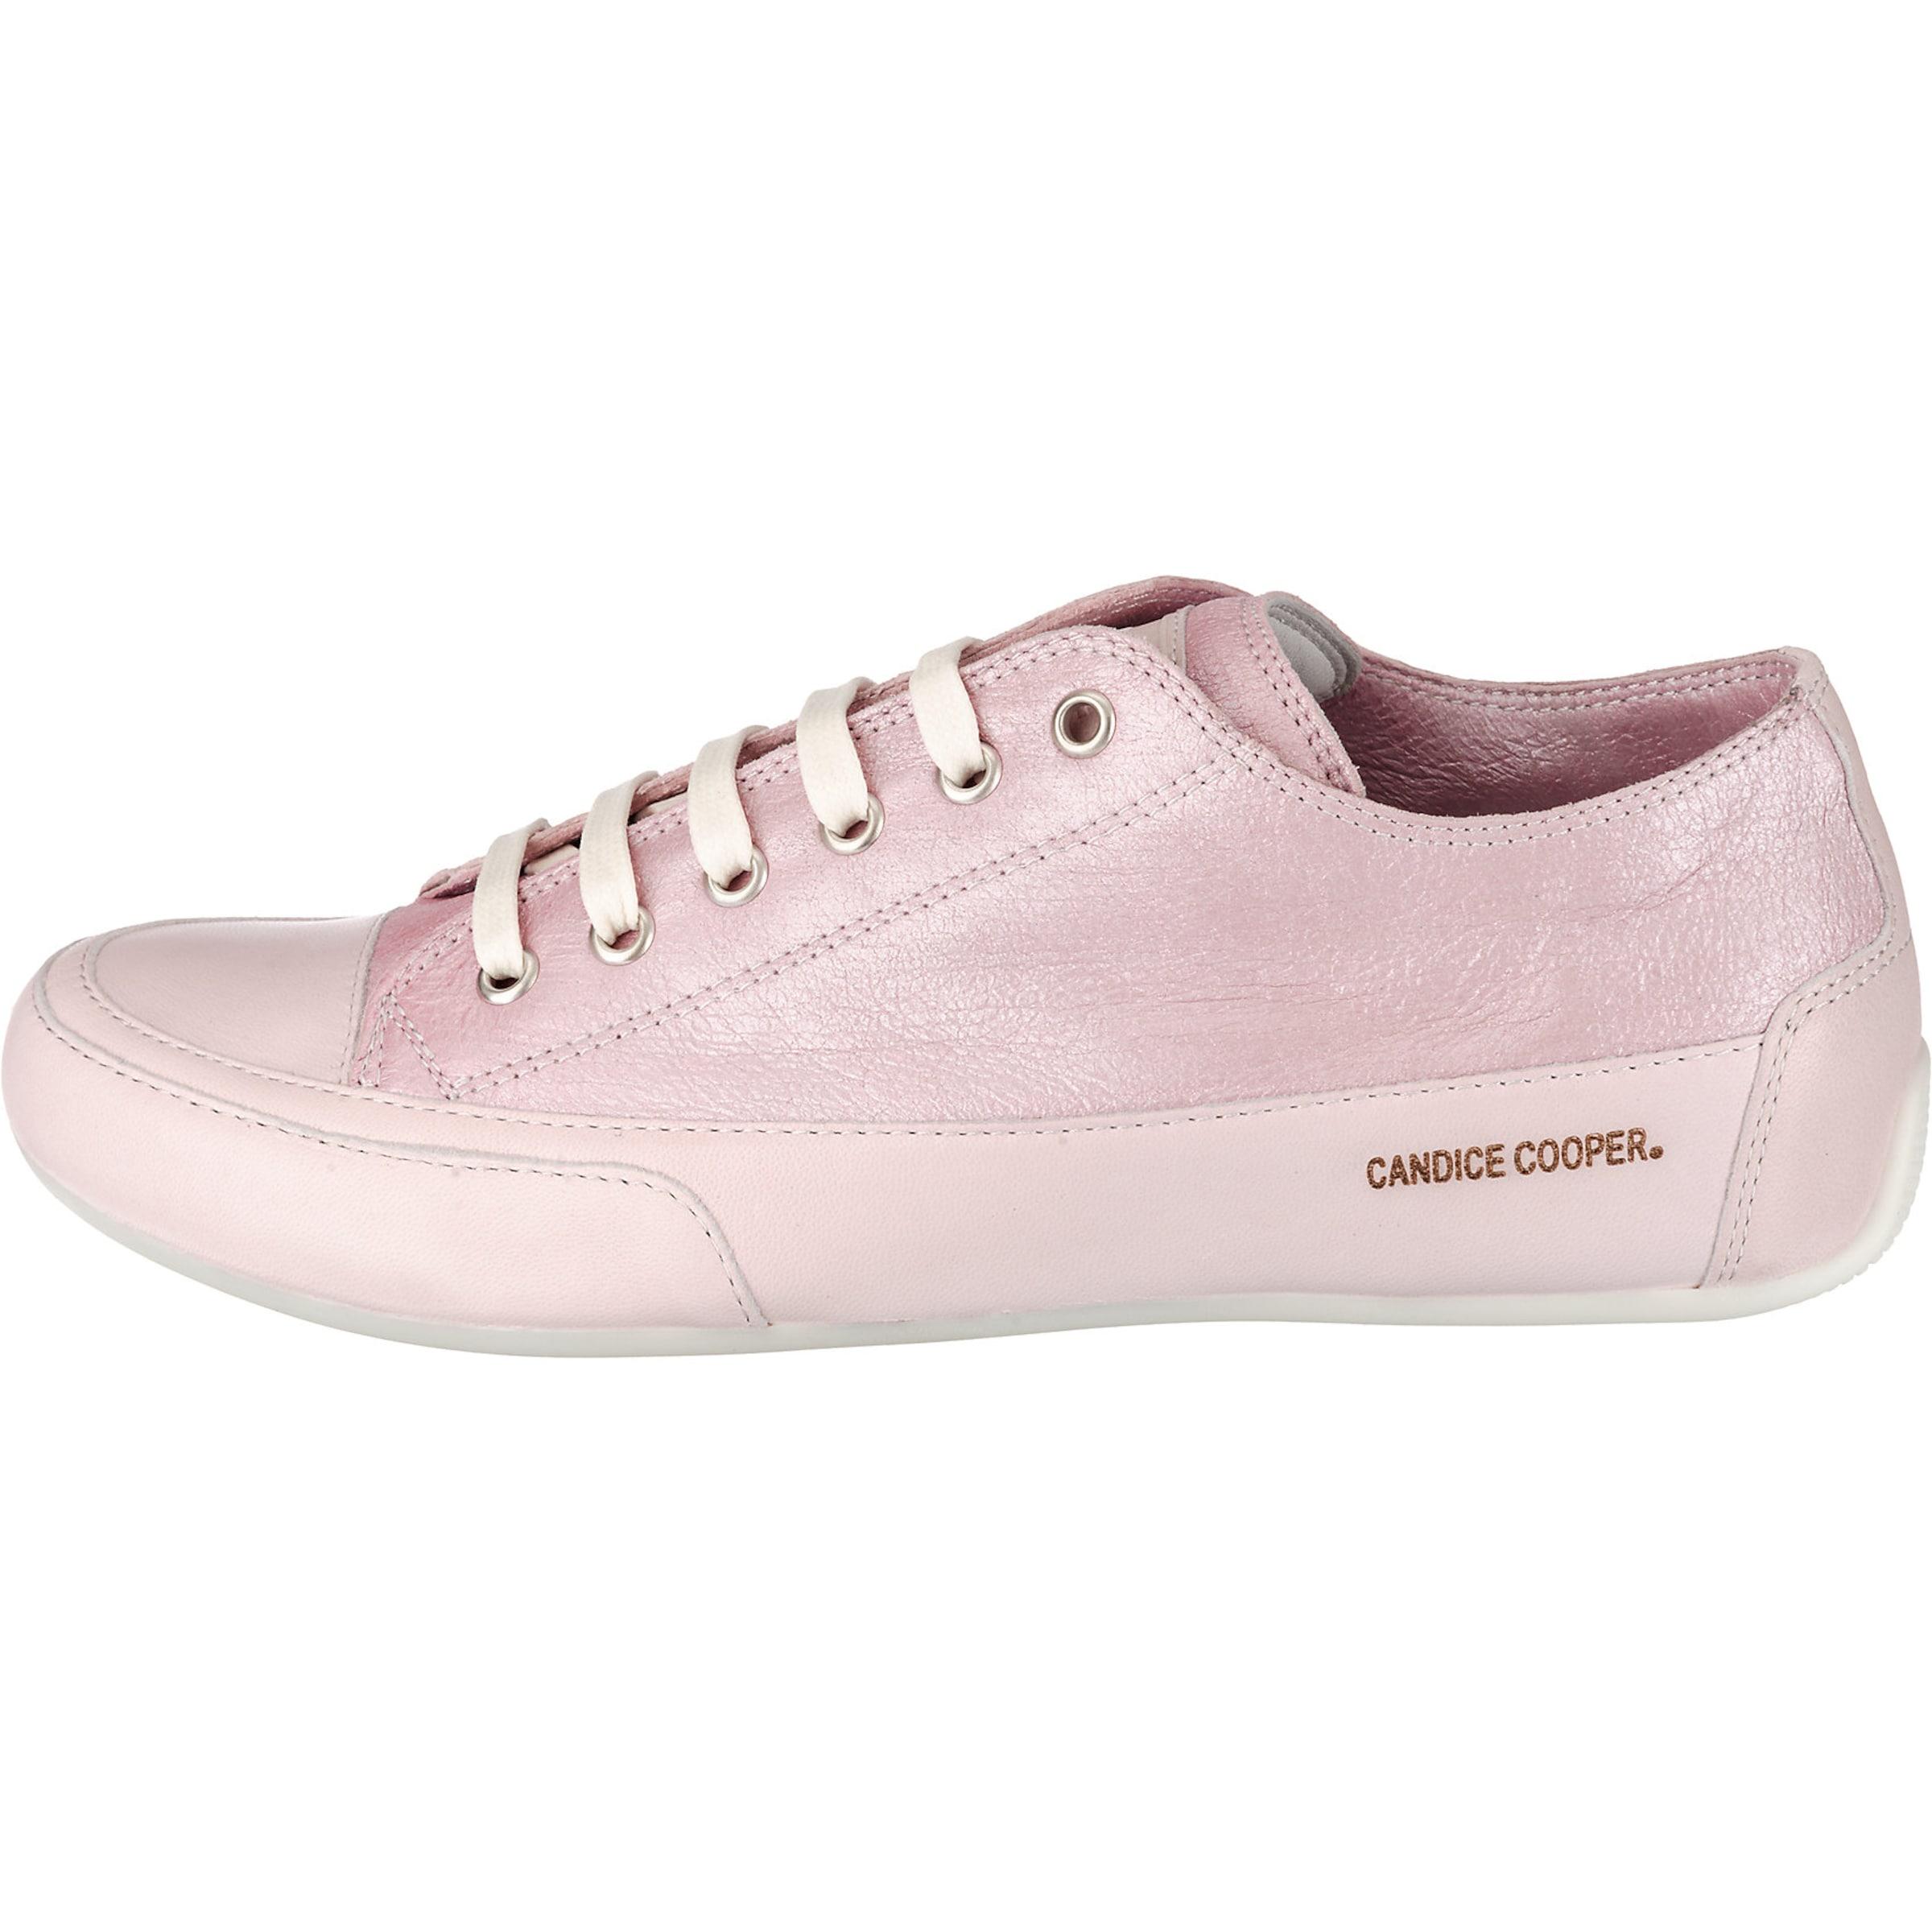 Cooper Candice In Sneakers Candice Cooper Sneakers Hellpink In Hellpink 5j4LAq3R